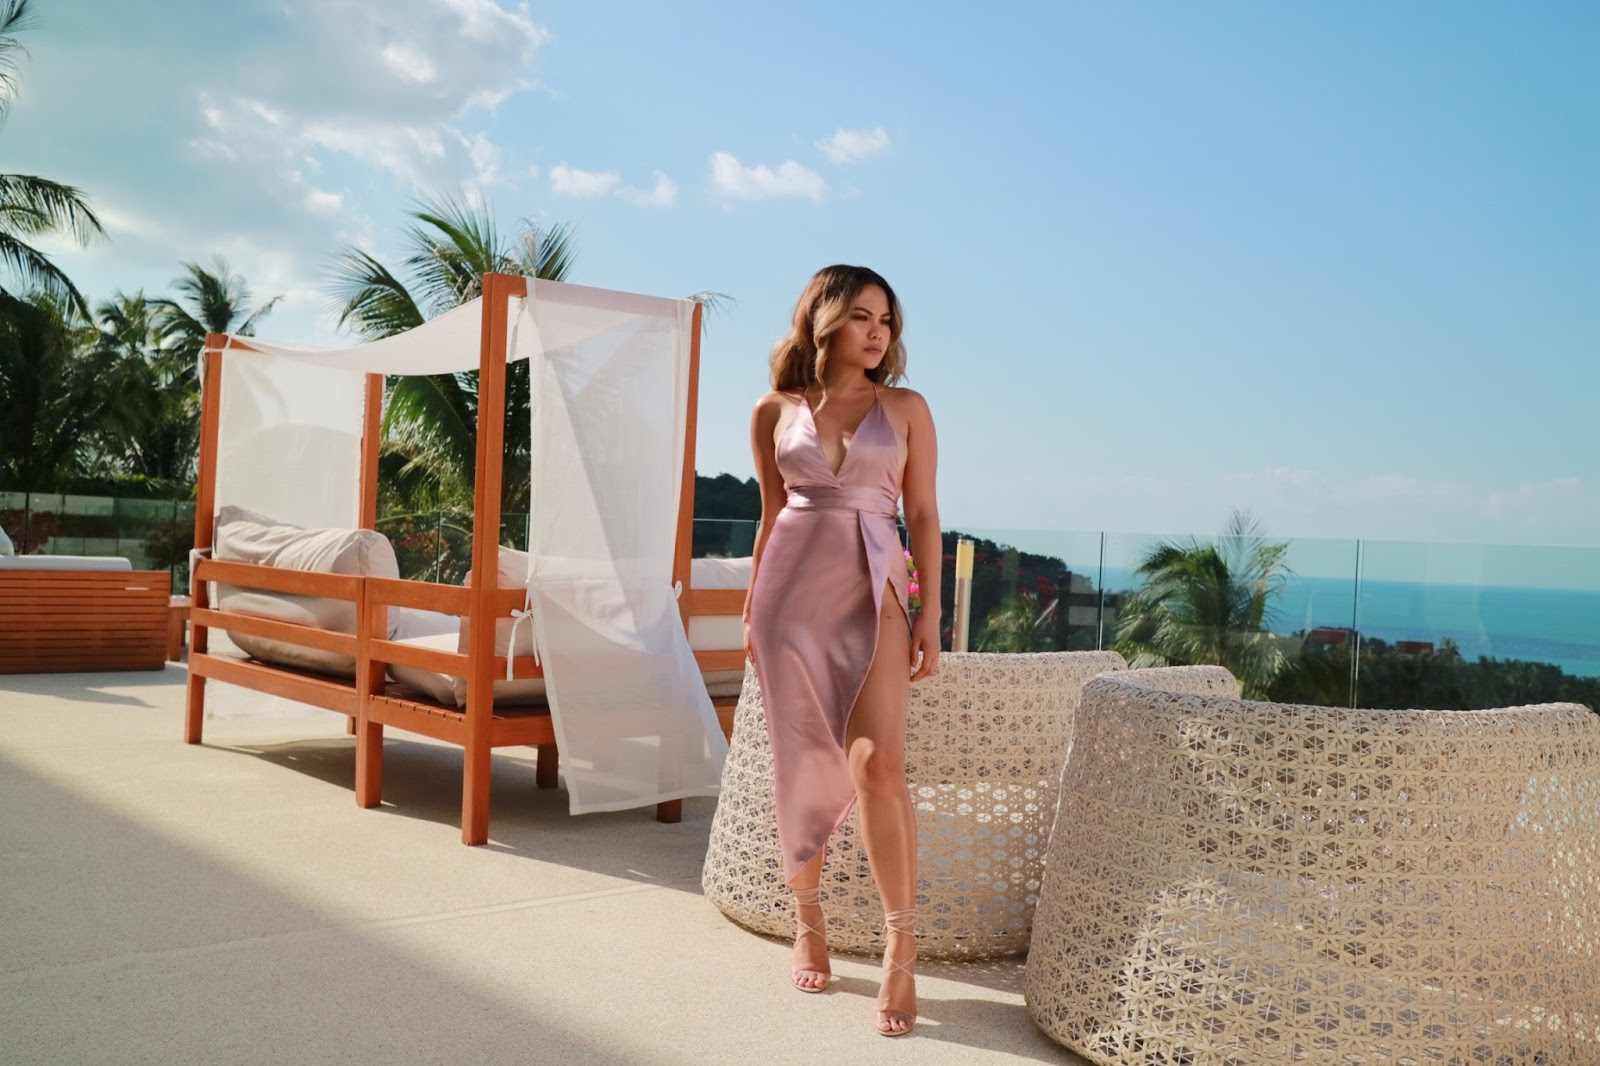 The Tropical Mauve Dress